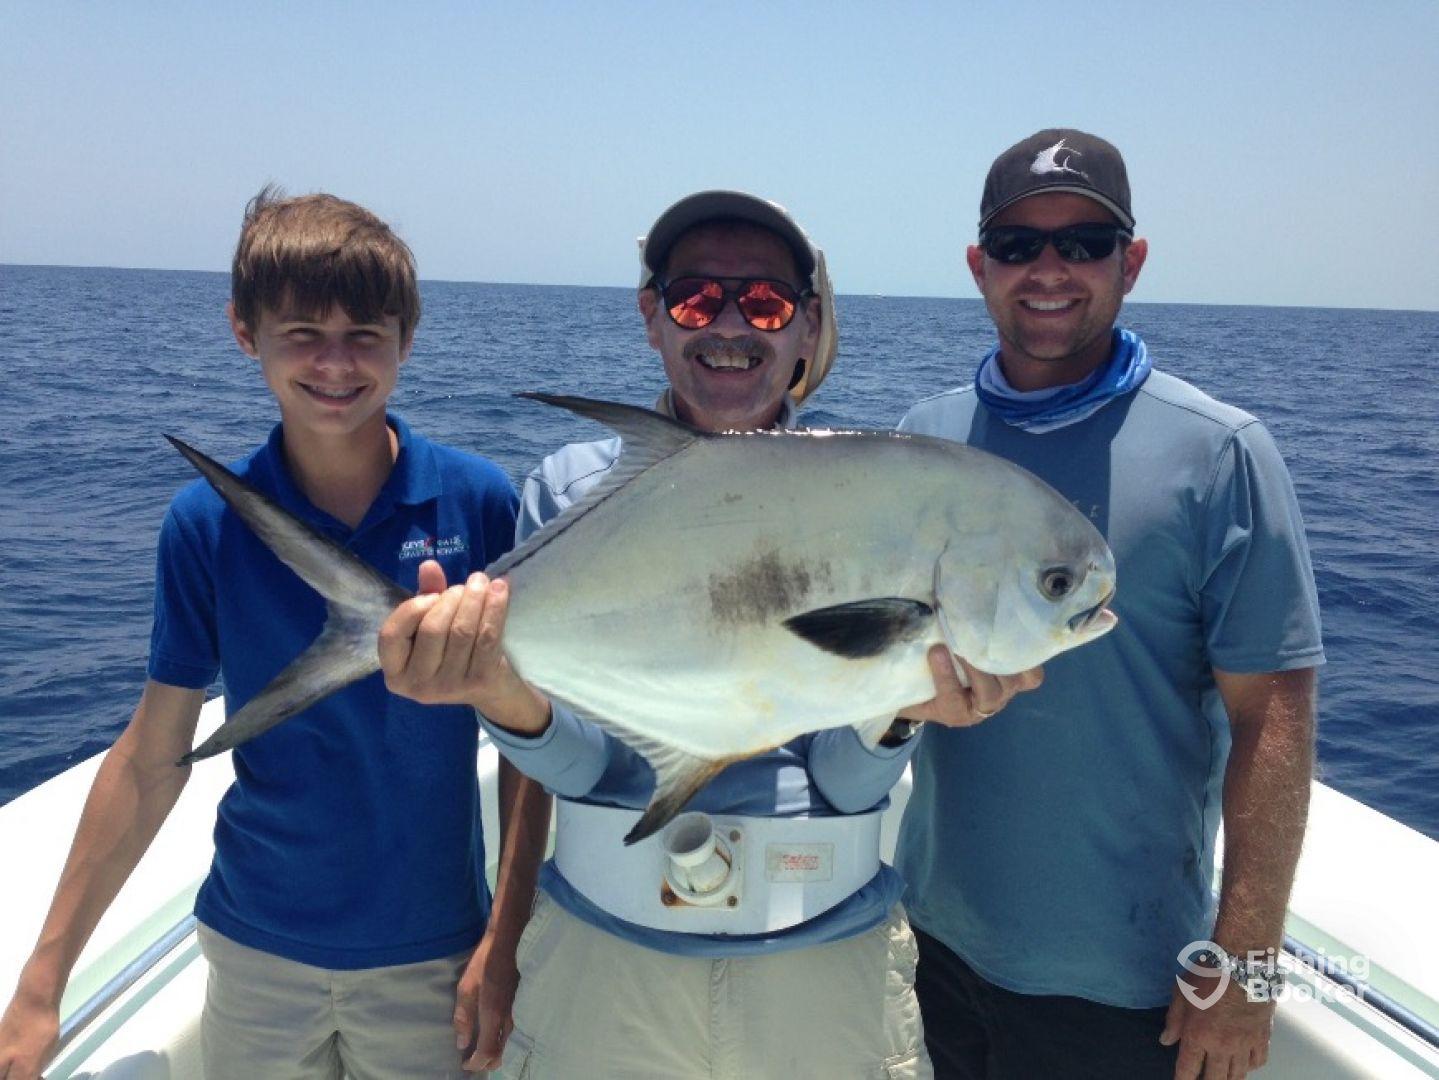 Reel deal charter fishing key largo fl fishingbooker for Key largo fishing guides